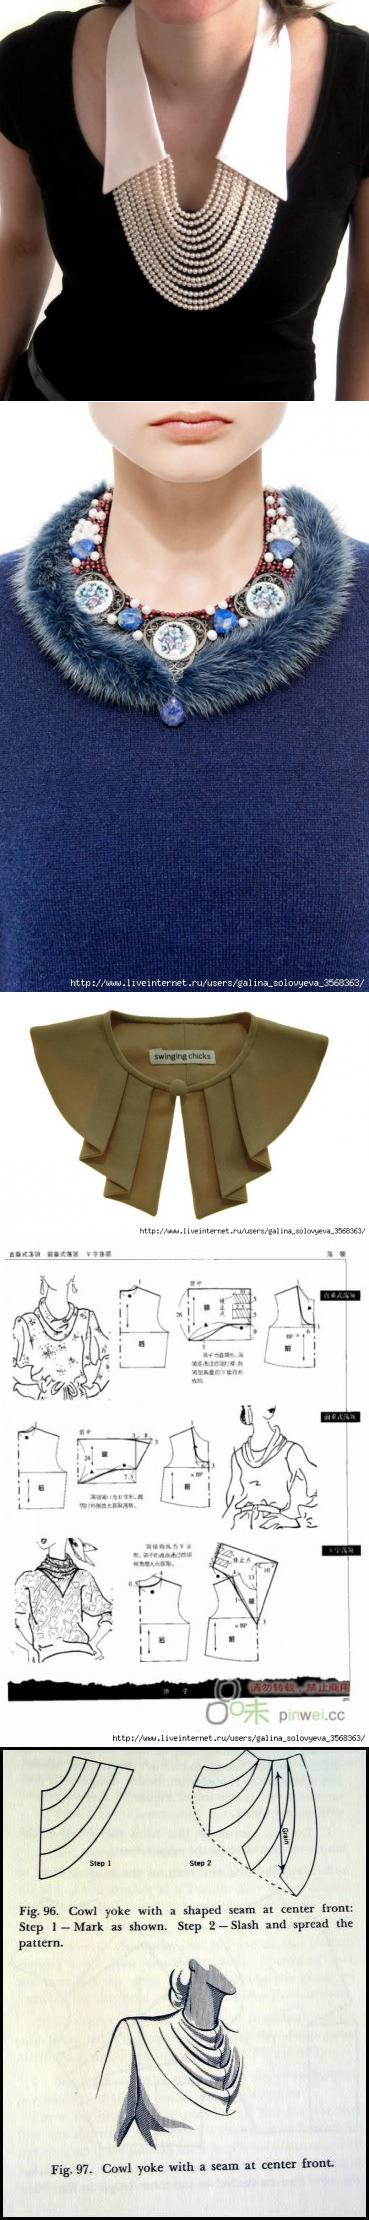 Stitch Collar Collections...♥ Deniz ♥